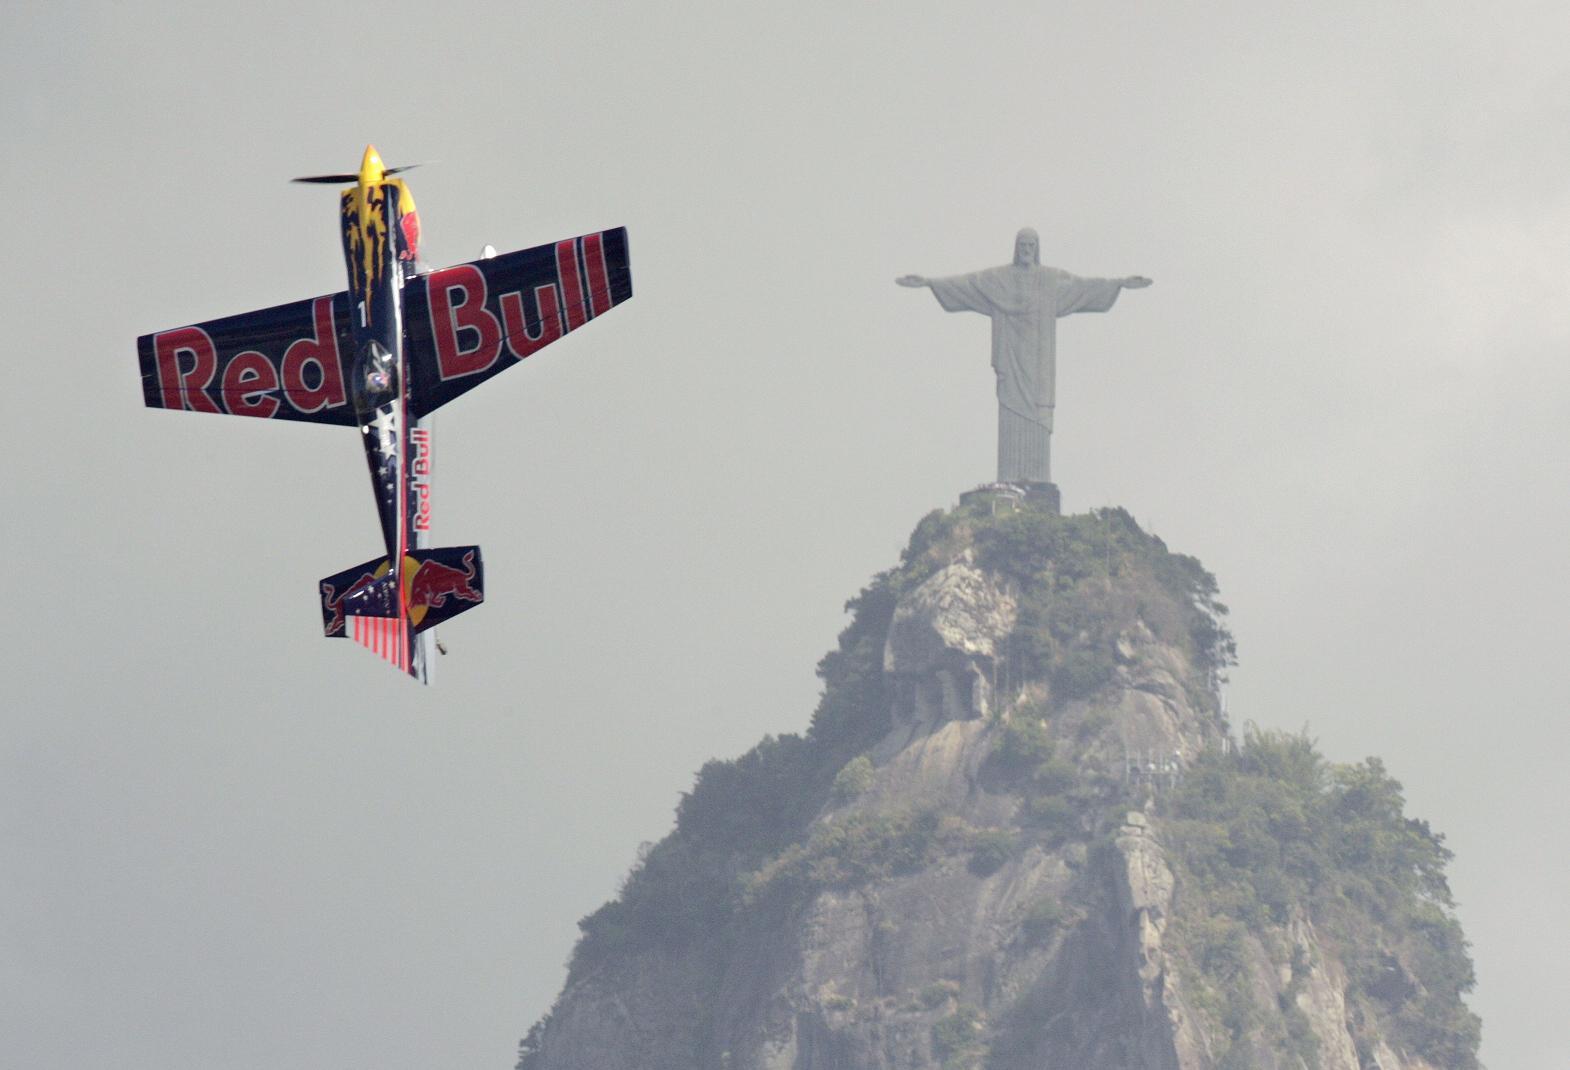 Red Bull Air Race Rio de Janeiro